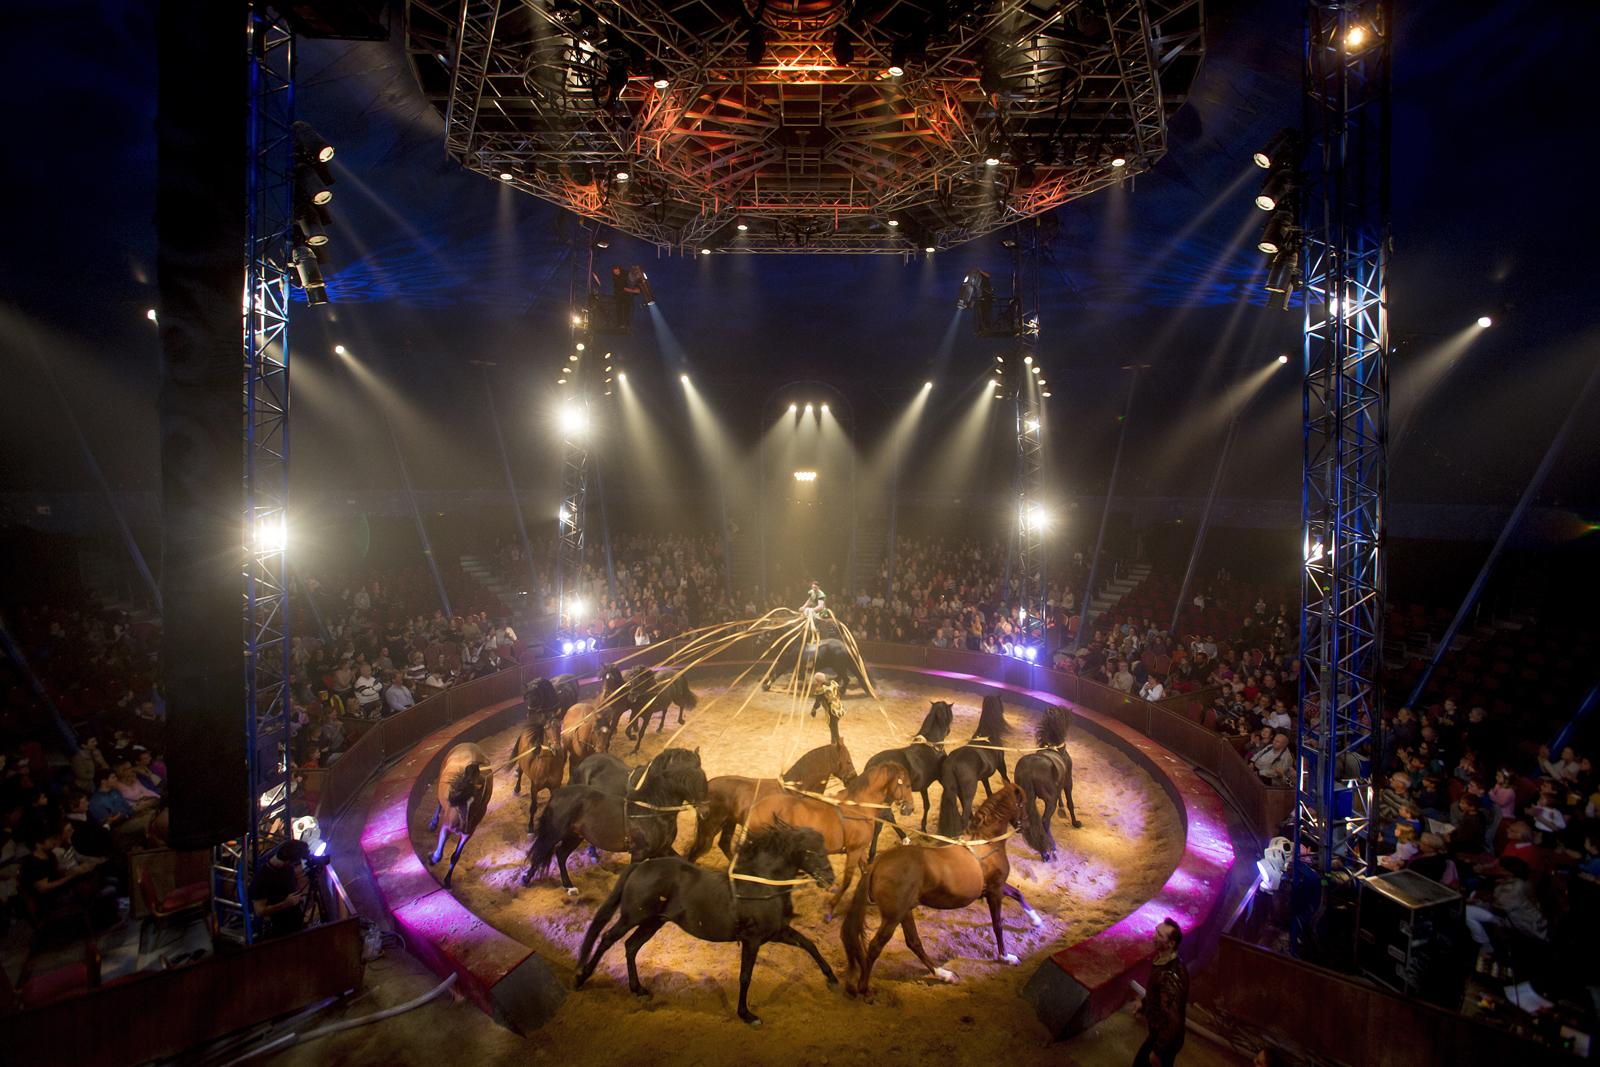 firmin-gruss-numero-poste-equestre-spectacle-quintessence-cirque-alexis-gruss-photo-karim-el-dib